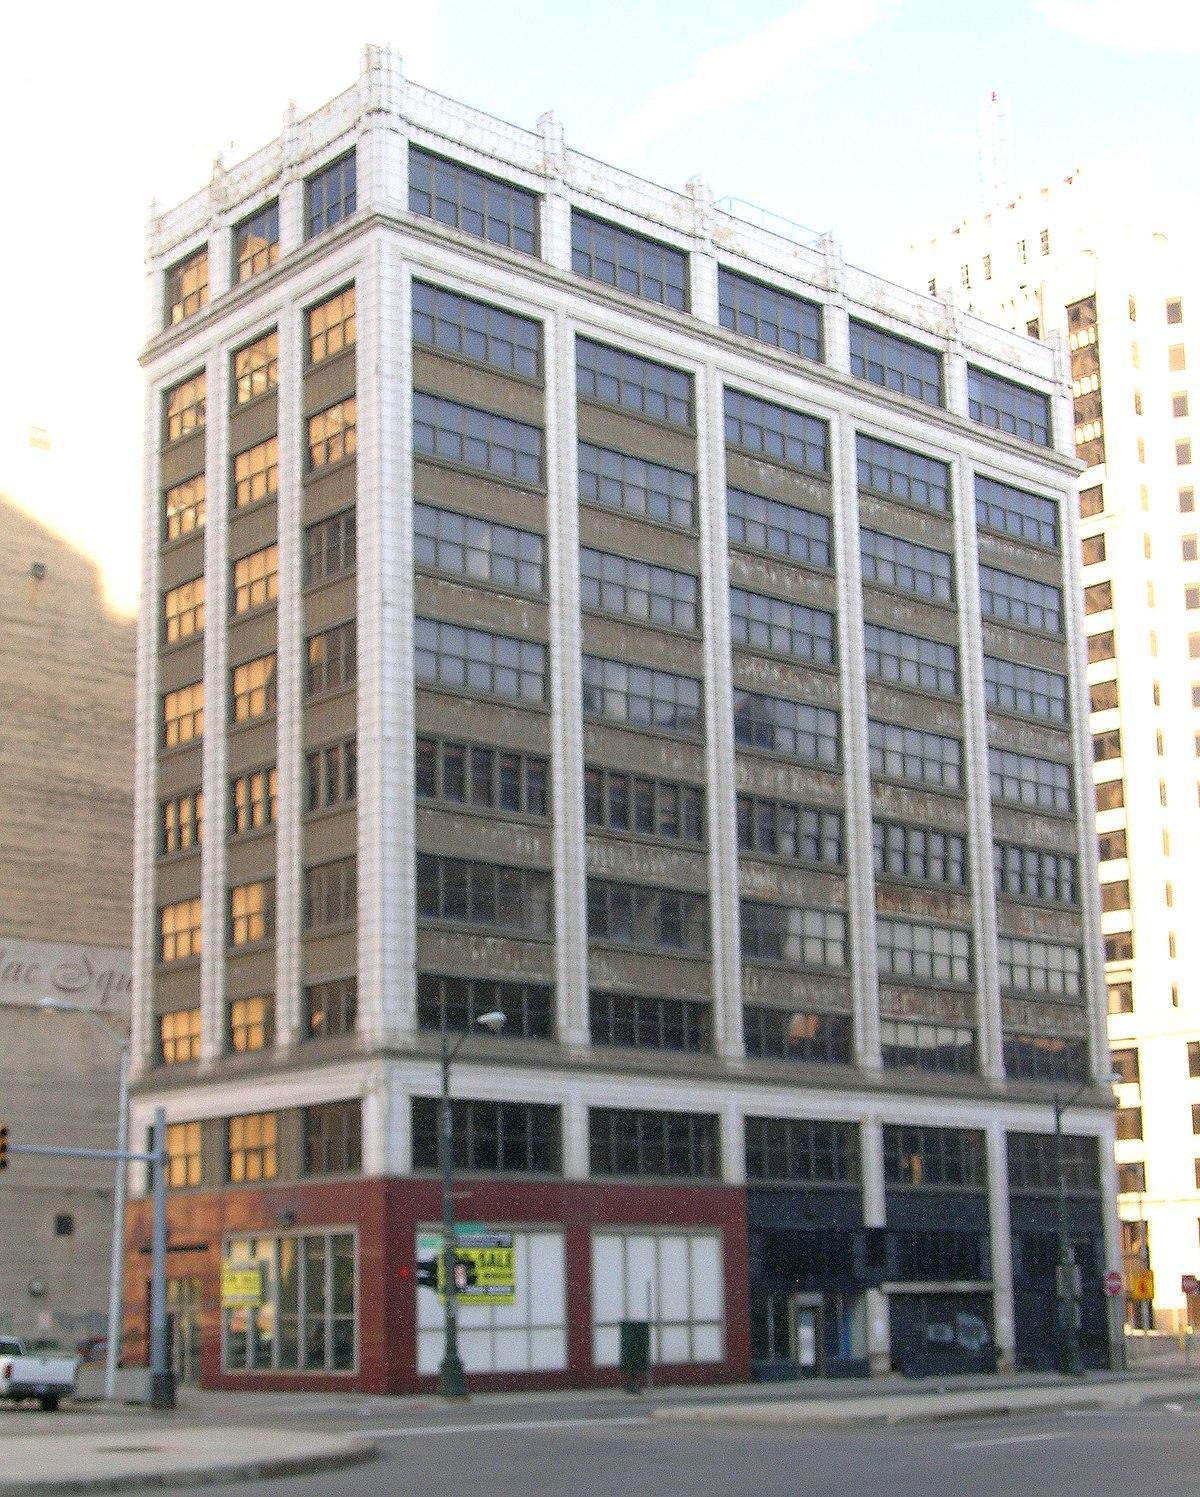 Lawyers Building - Wikipedia